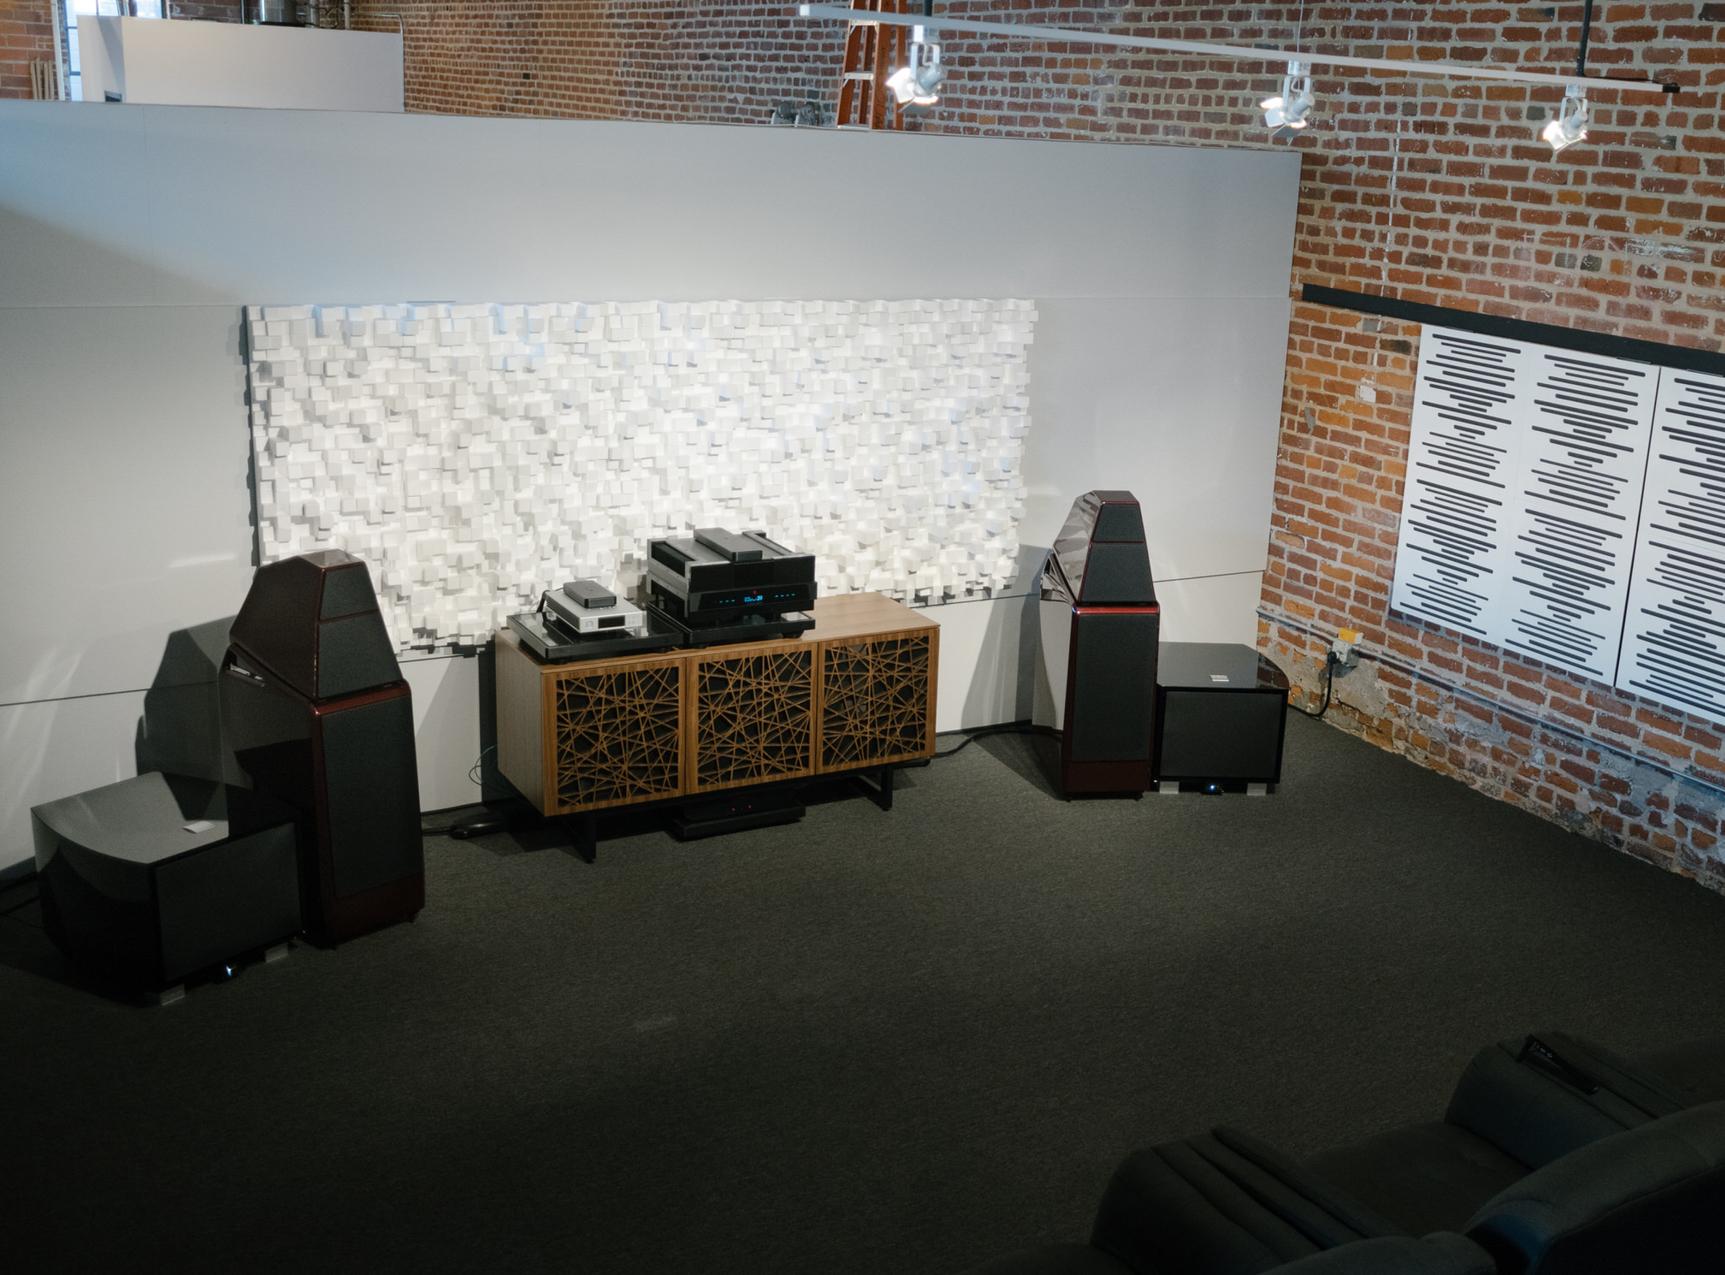 The Sound Environment Kansas City